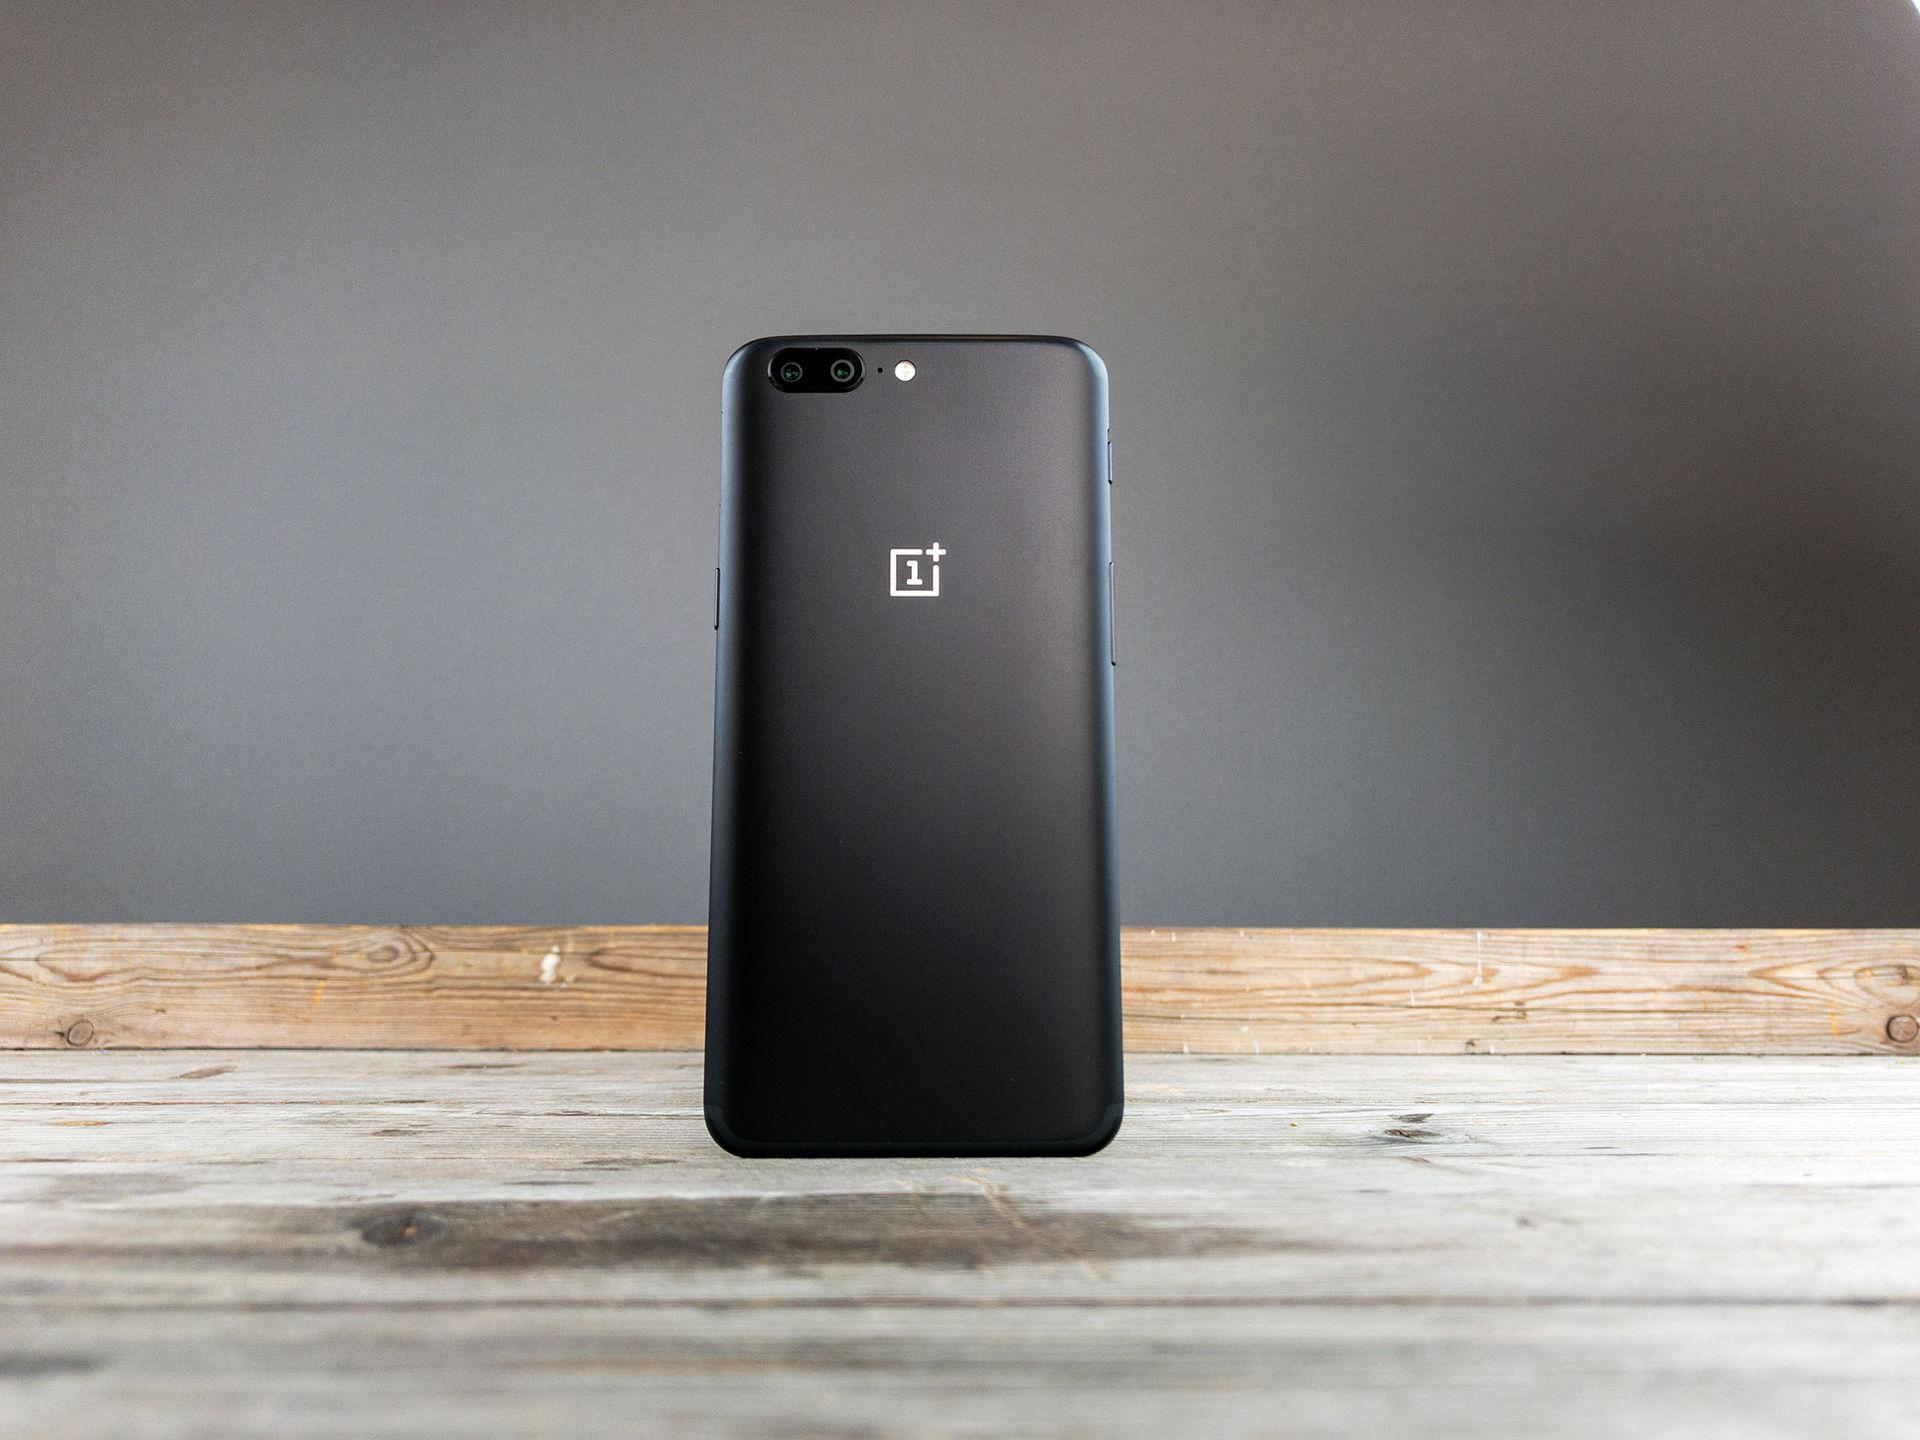 Vi har testat OnePlus 5